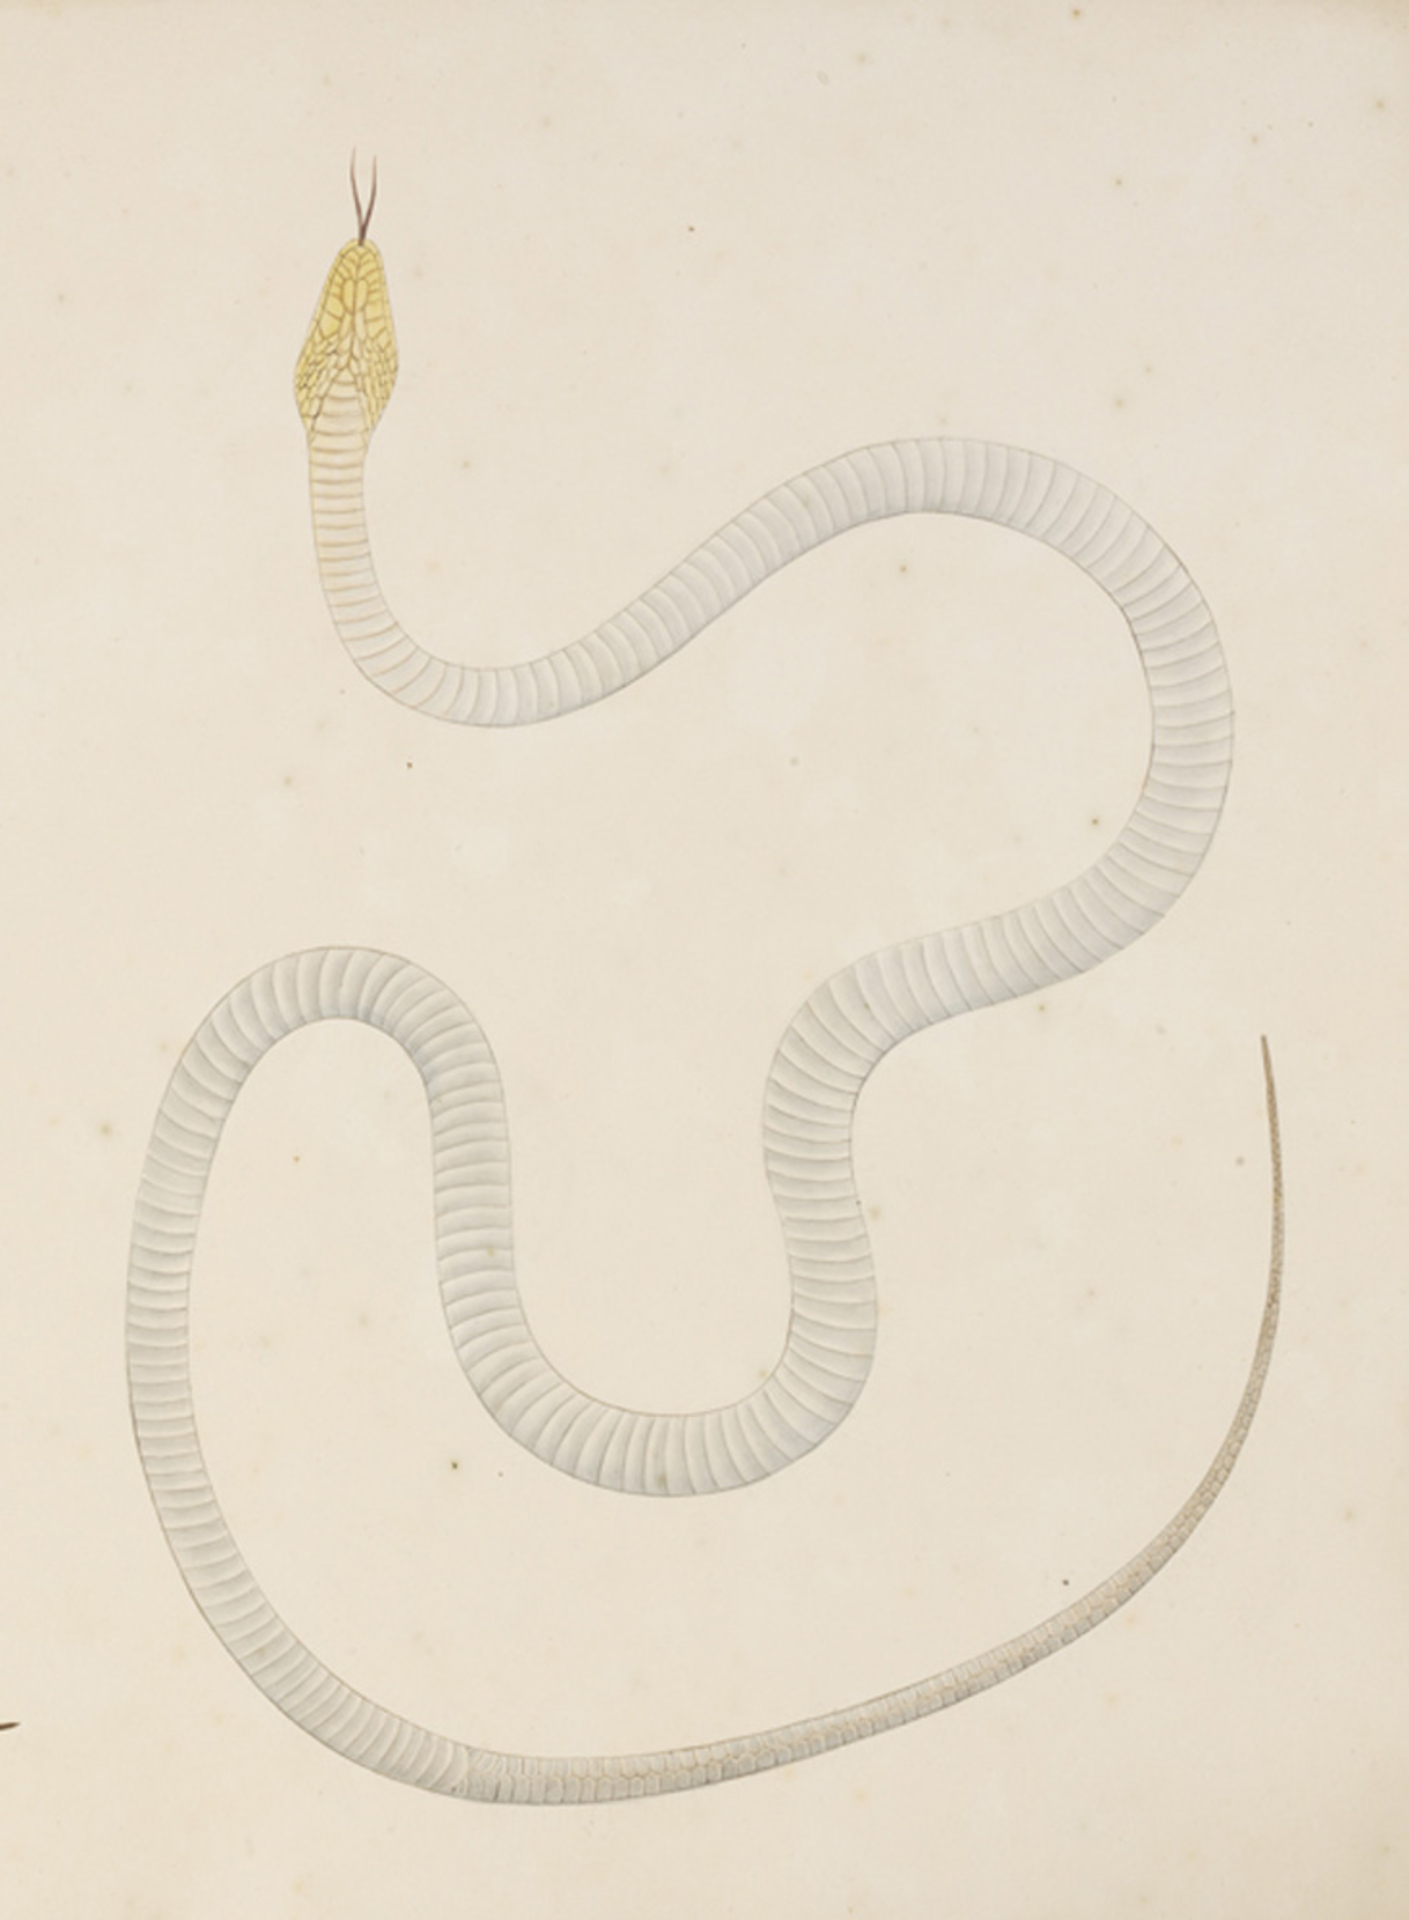 RMNH.ART.123 | Elaphe quadrivirgata